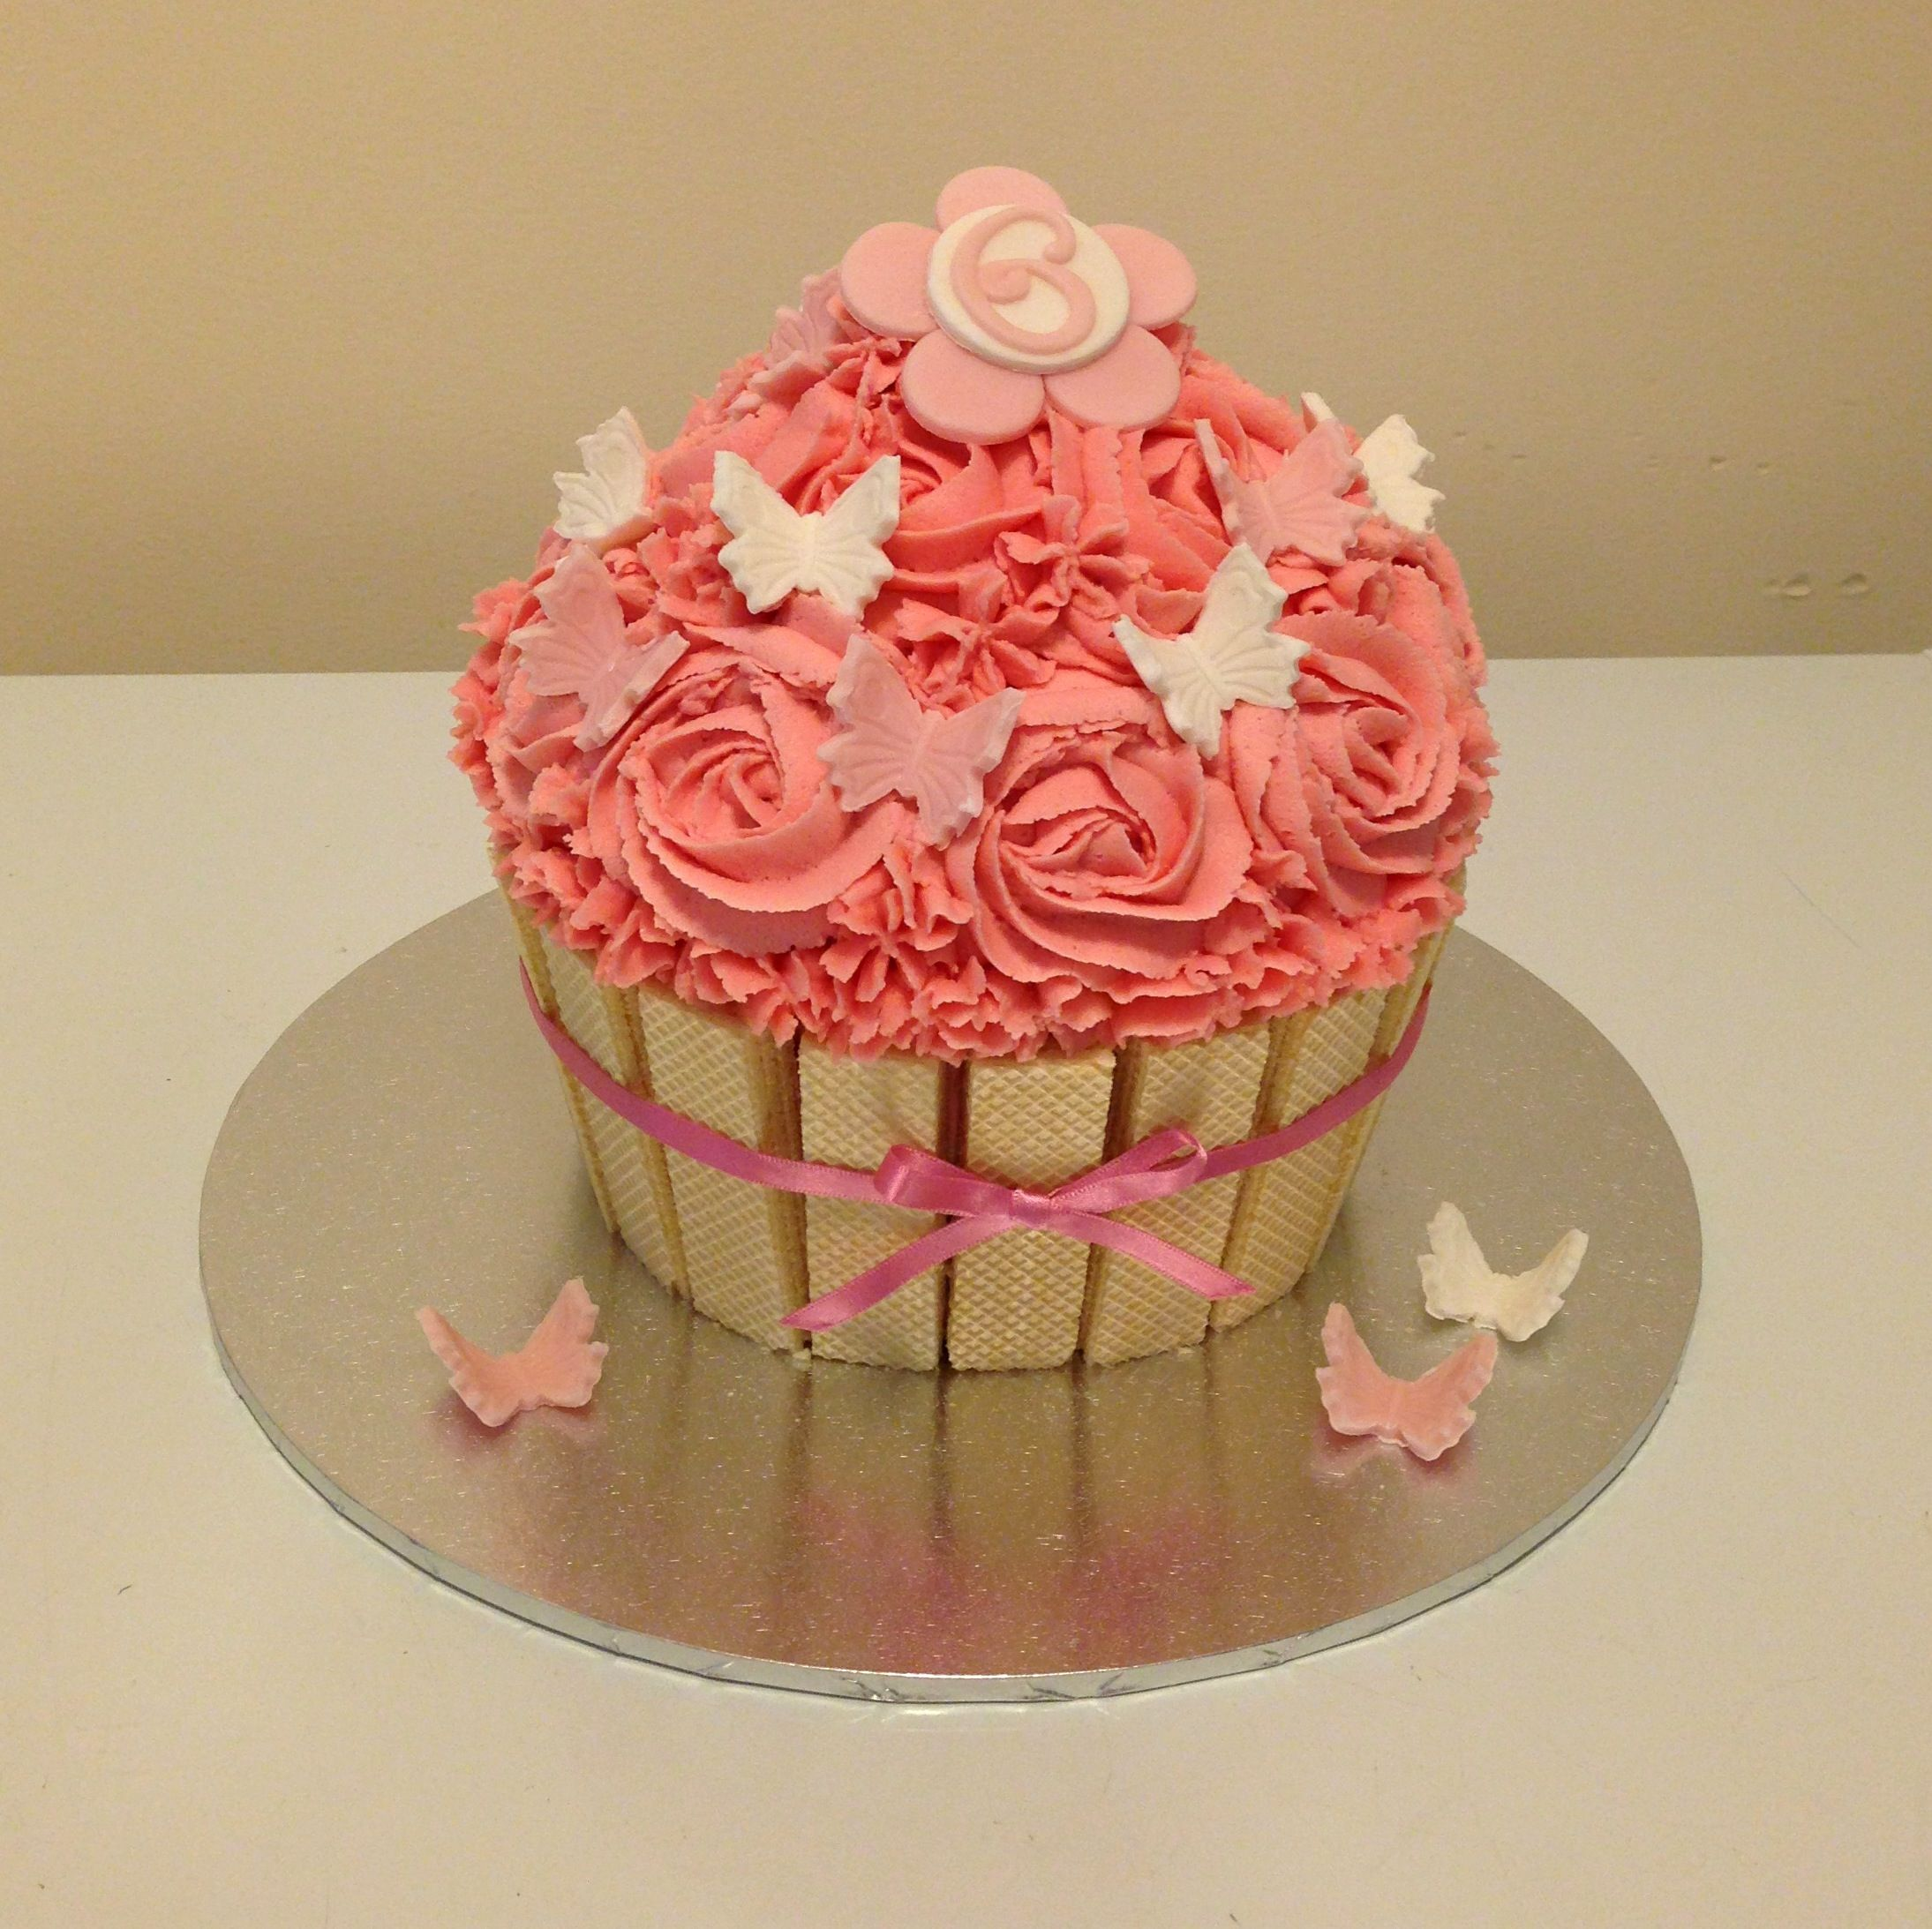 Pin Butterfly 34 33 32 31 30 Cake on Pinterest